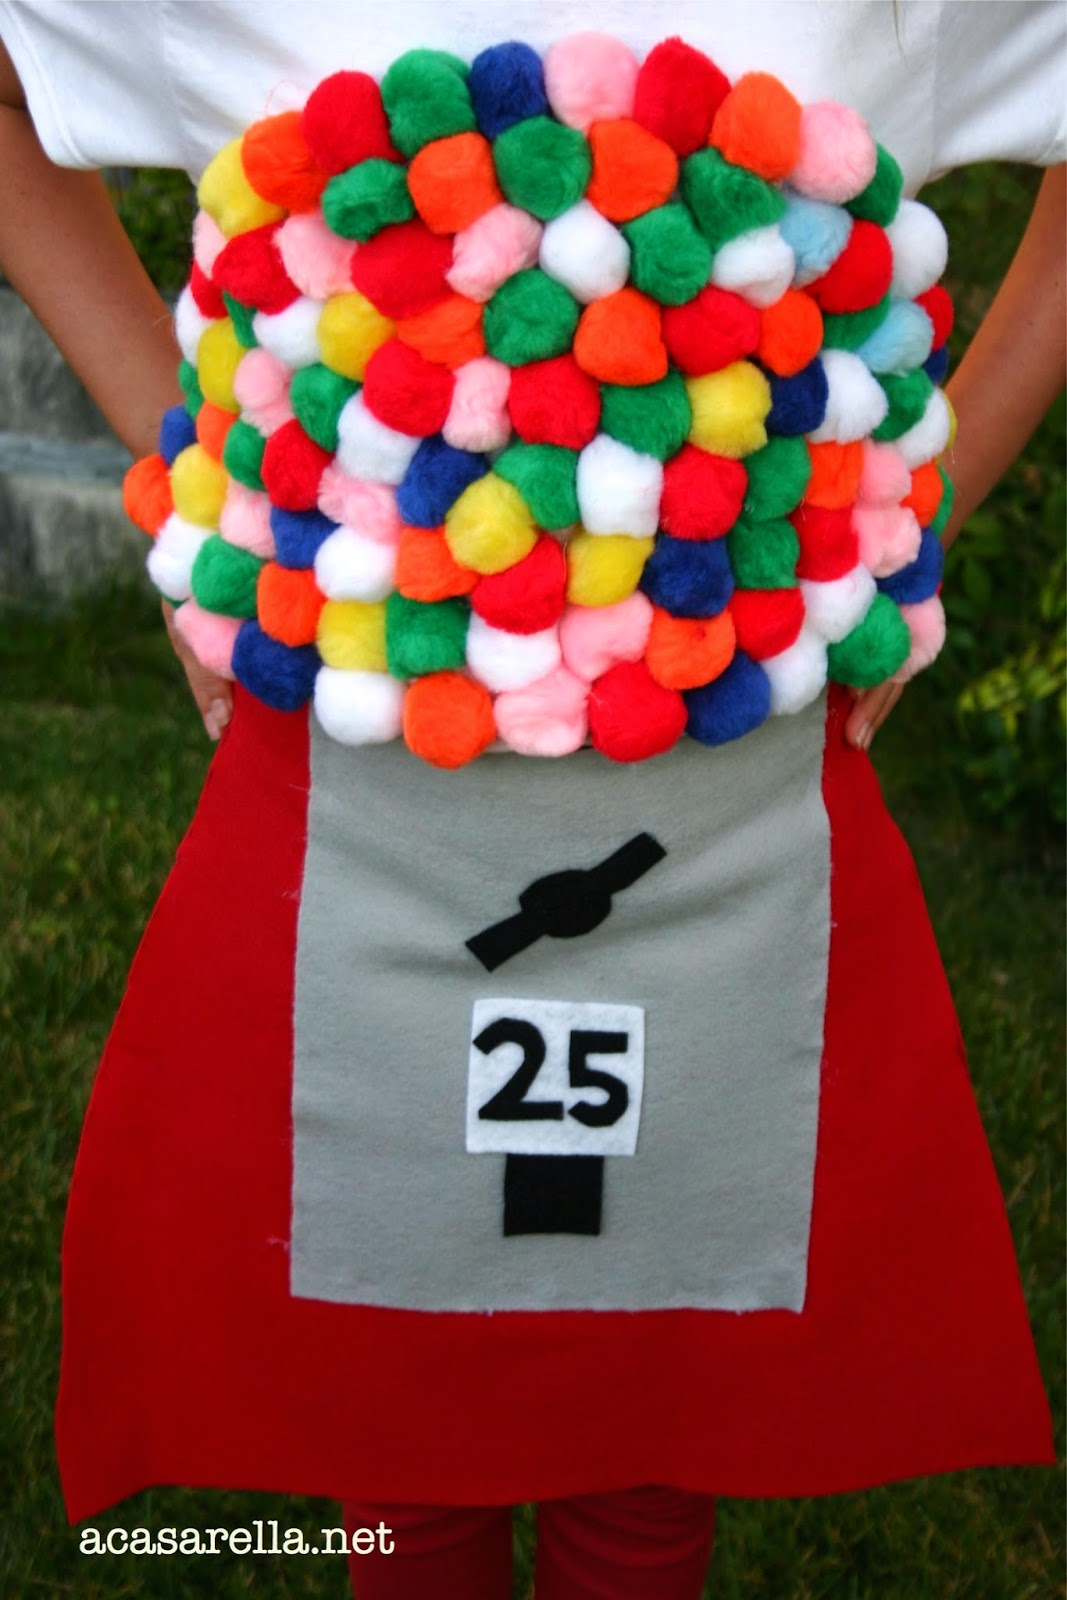 bubblegum machine costume